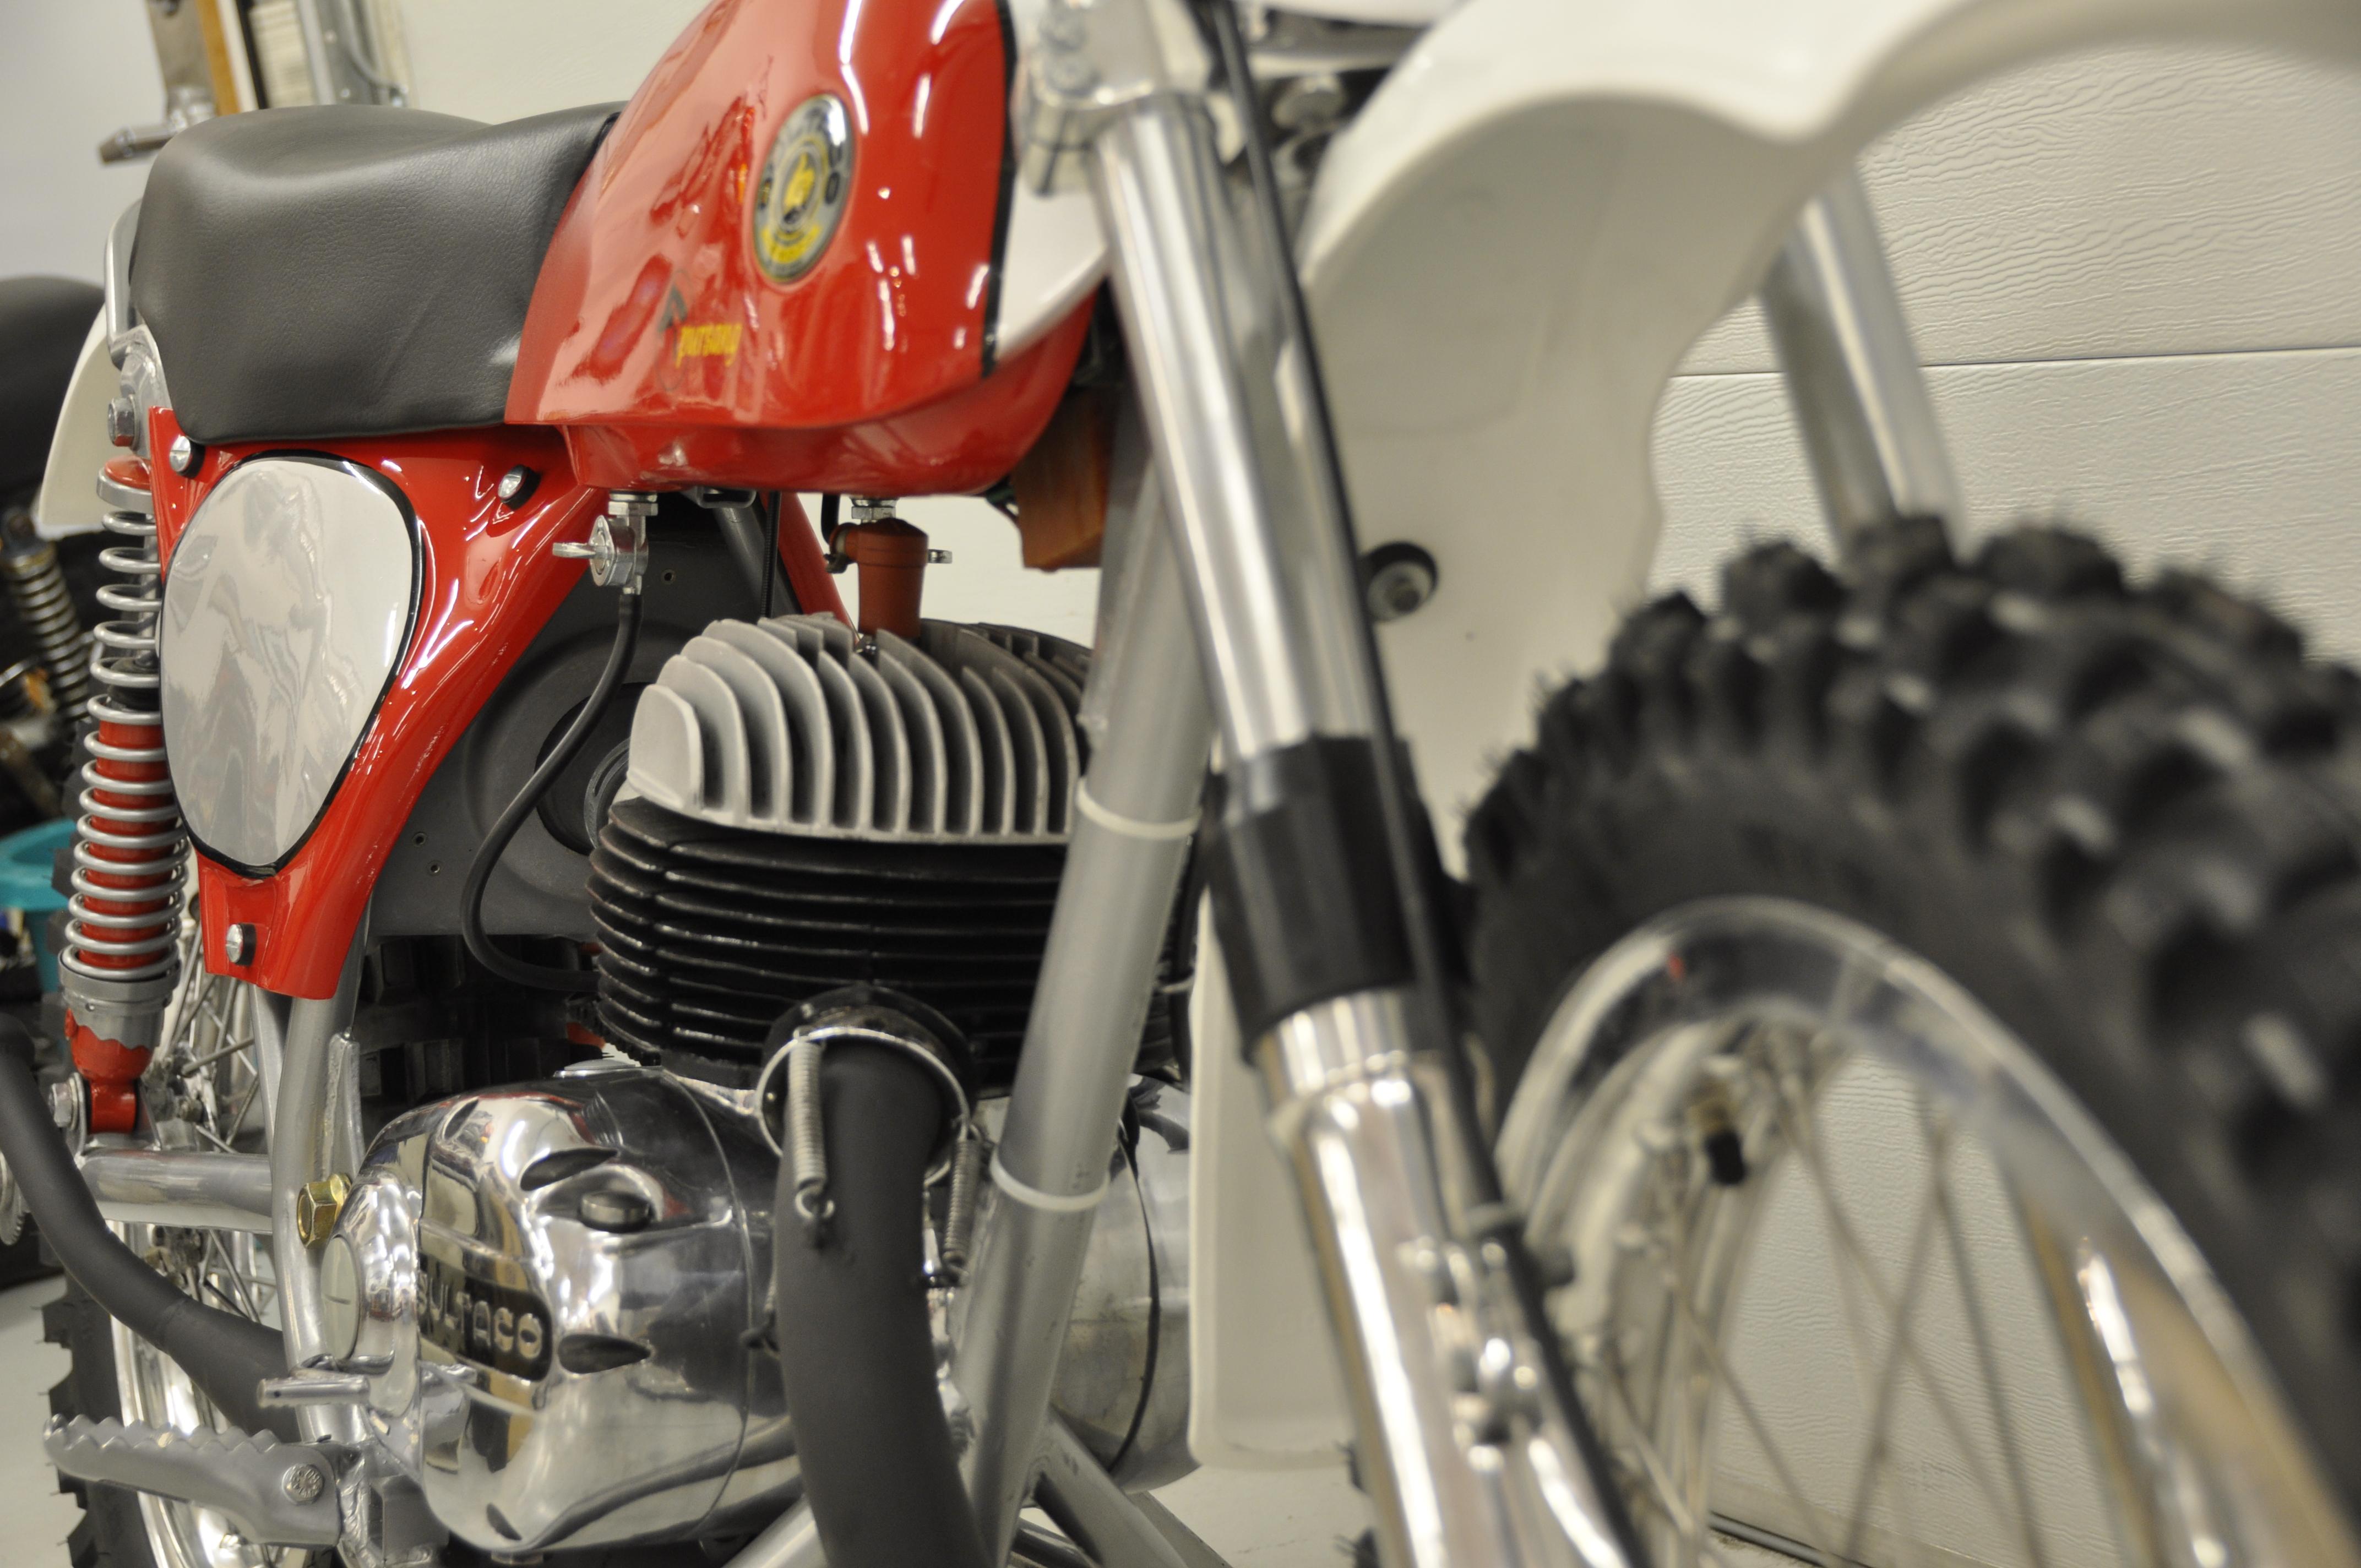 Bultaco Pursang MK6 M101 - Unique Motorcars